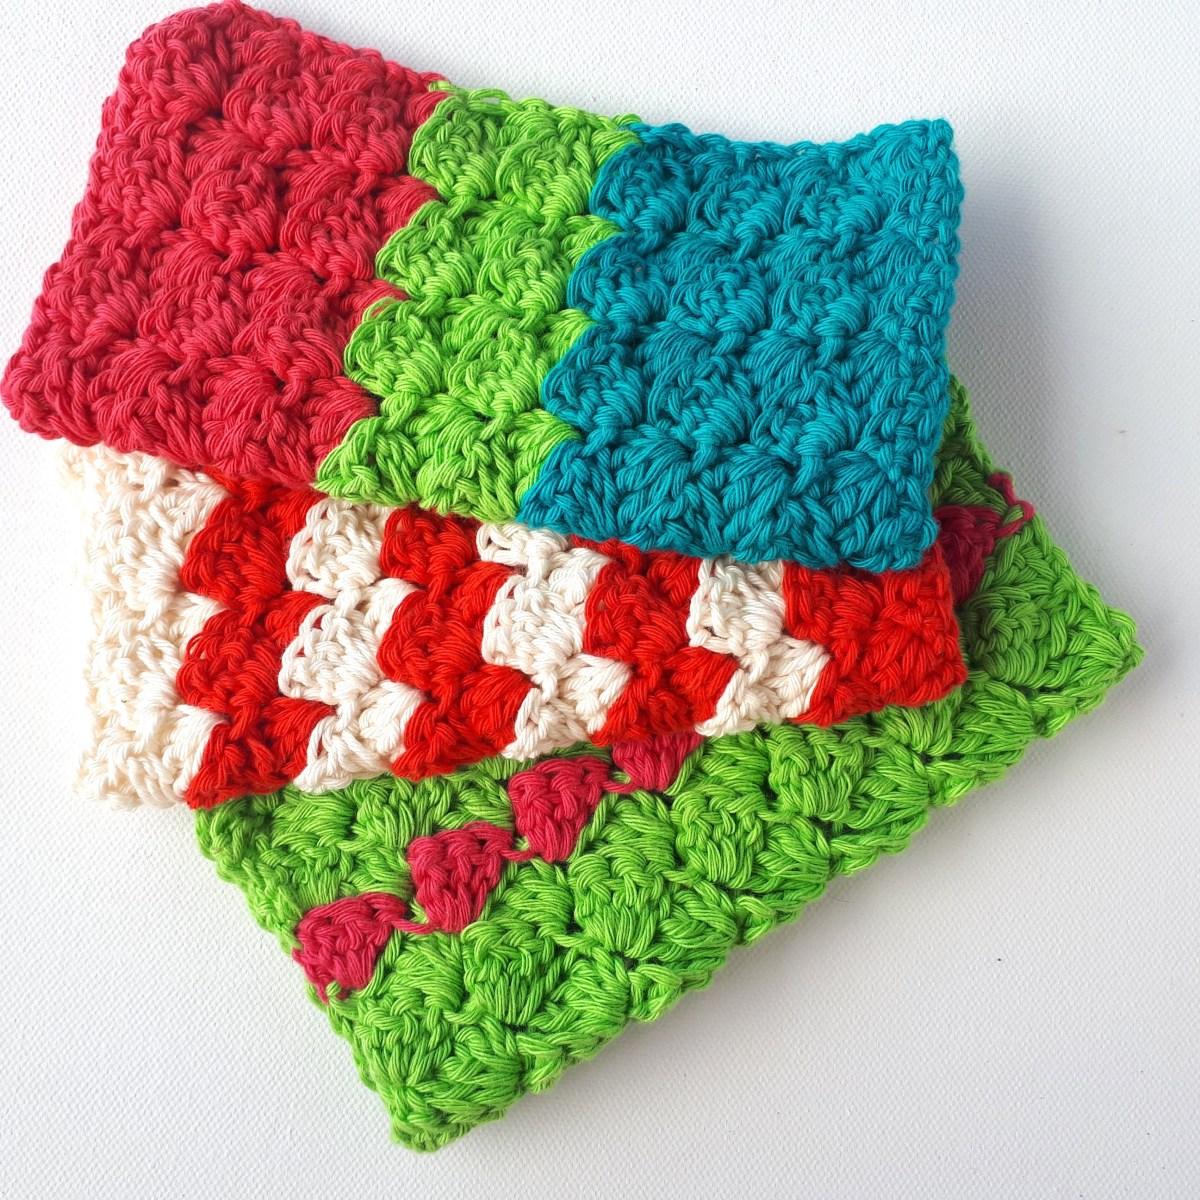 Quick and Simple Dish Cloth Crochet Pattern Cheery Crochet Dish Cloths Free Pattern Annie Design Crochet